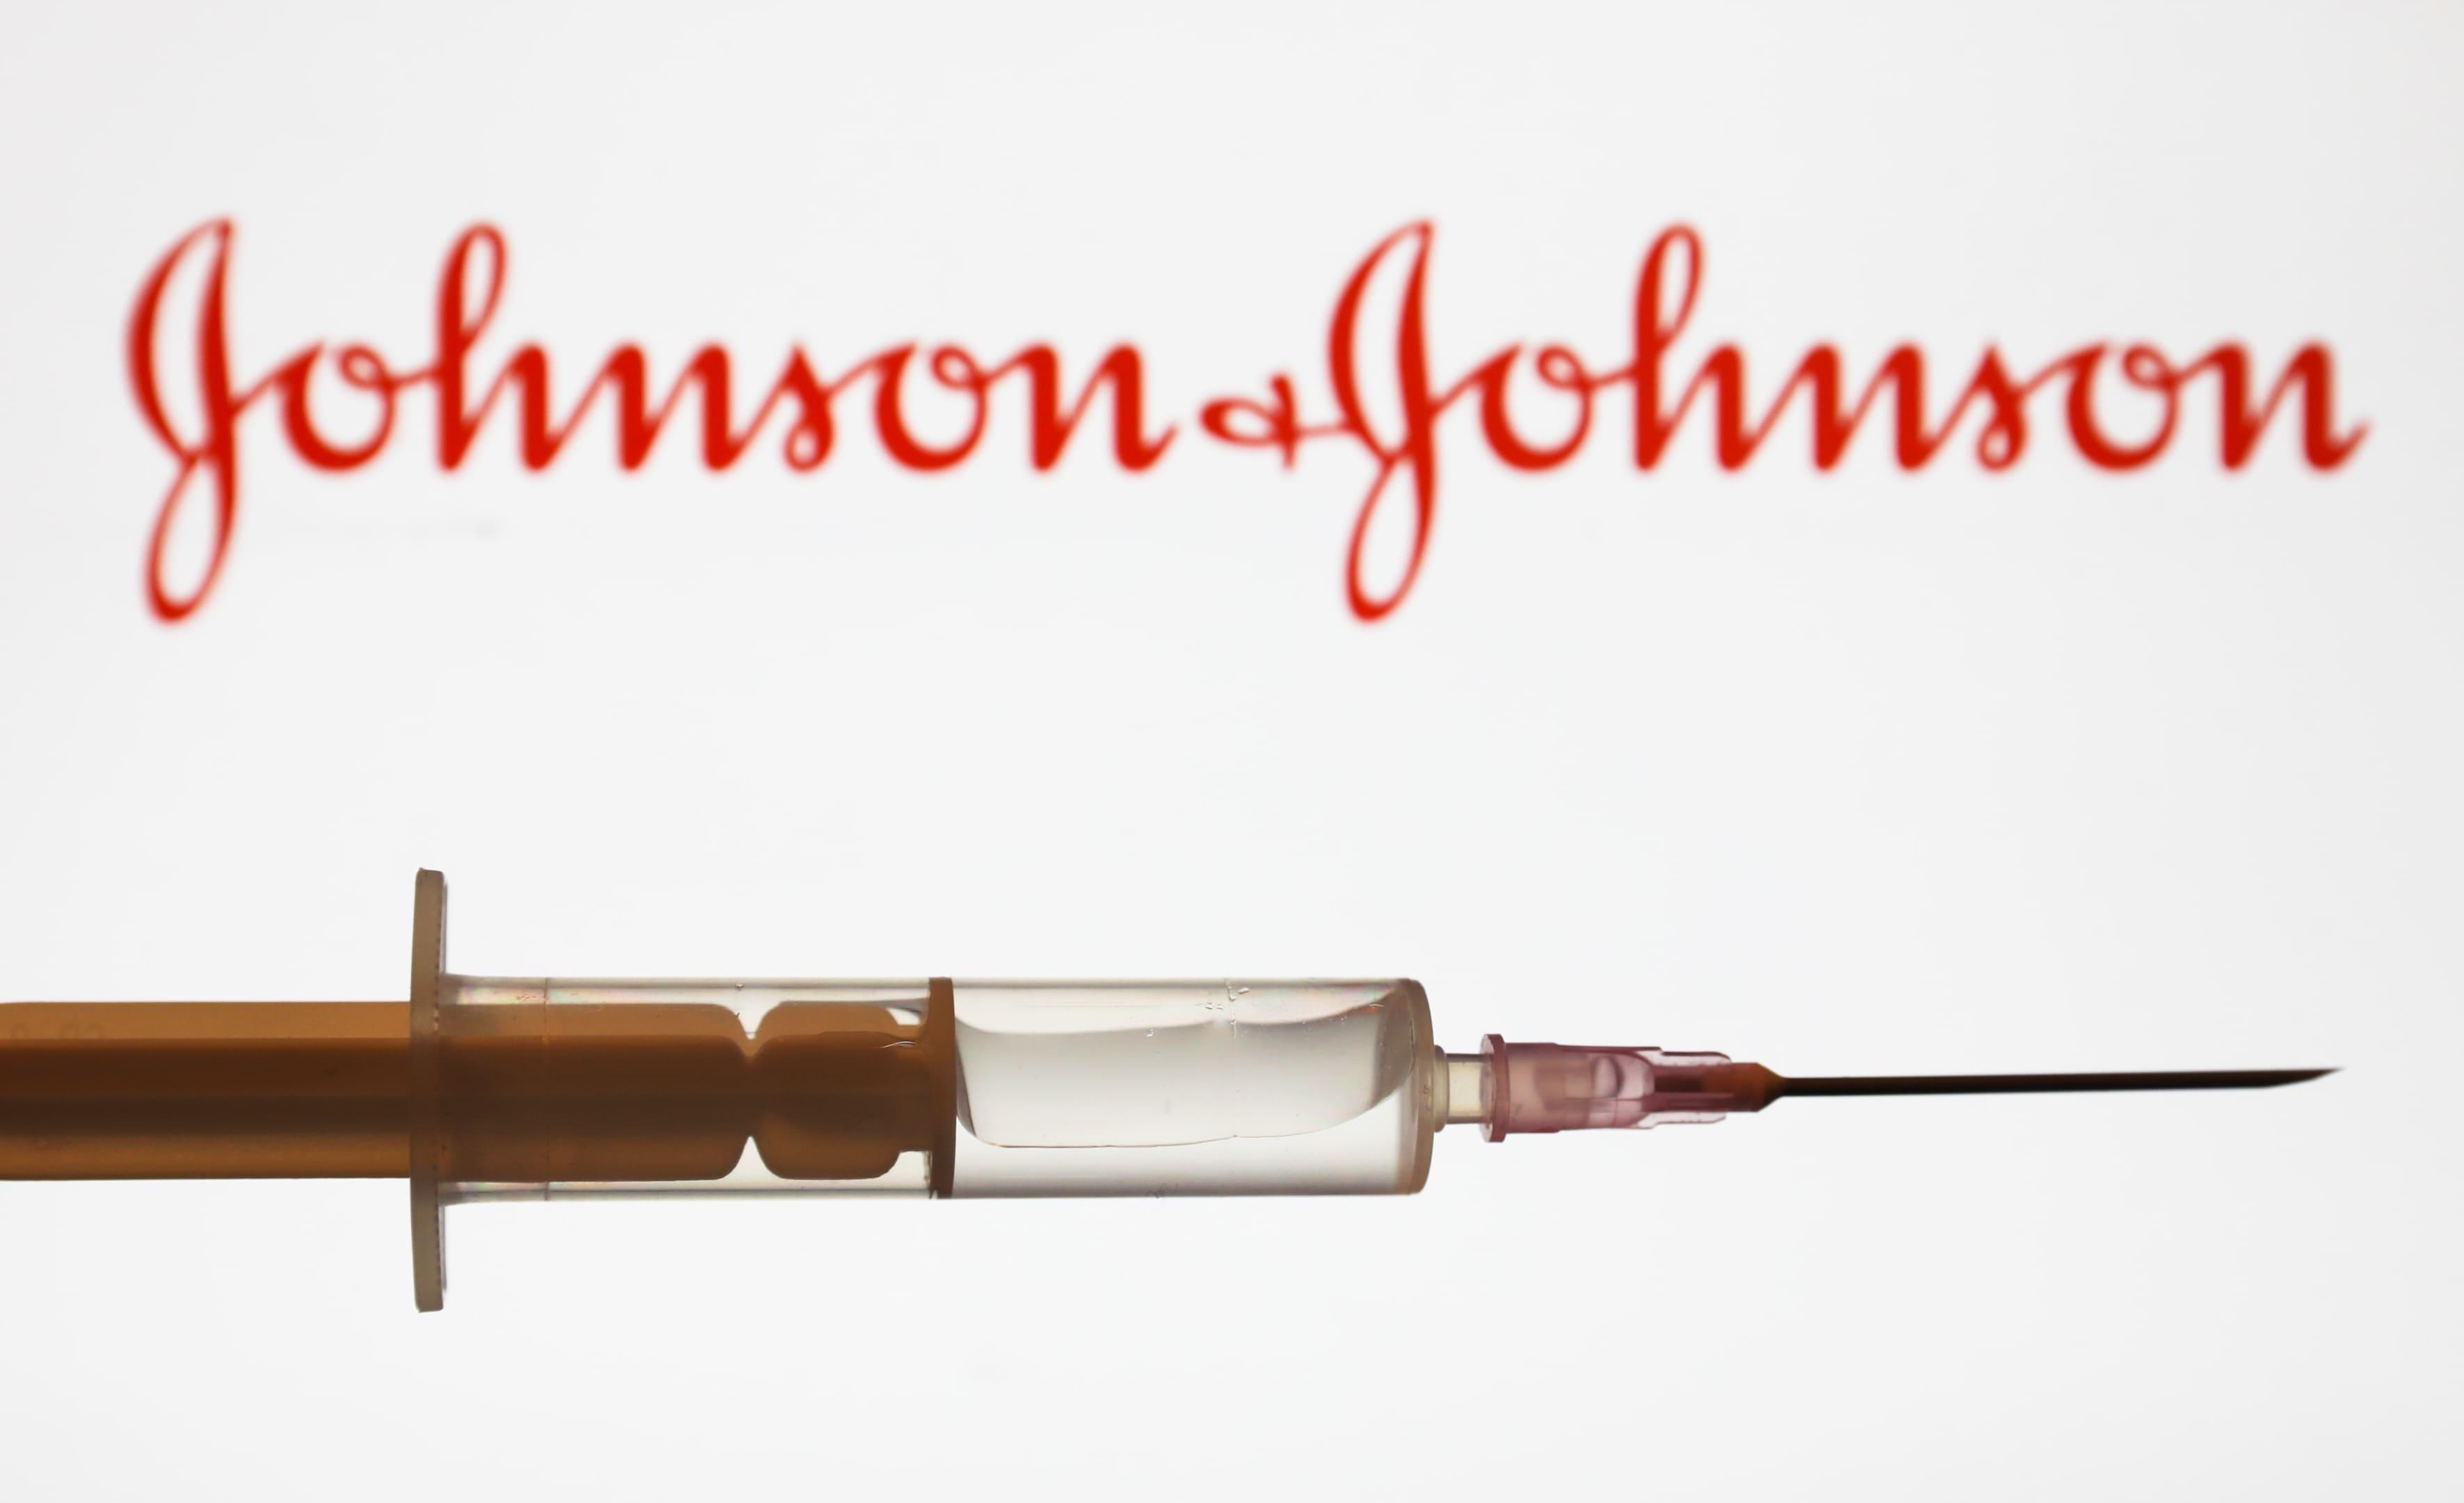 Johnson & Johnson enters late-stage trial testing its coronavirus vaccine